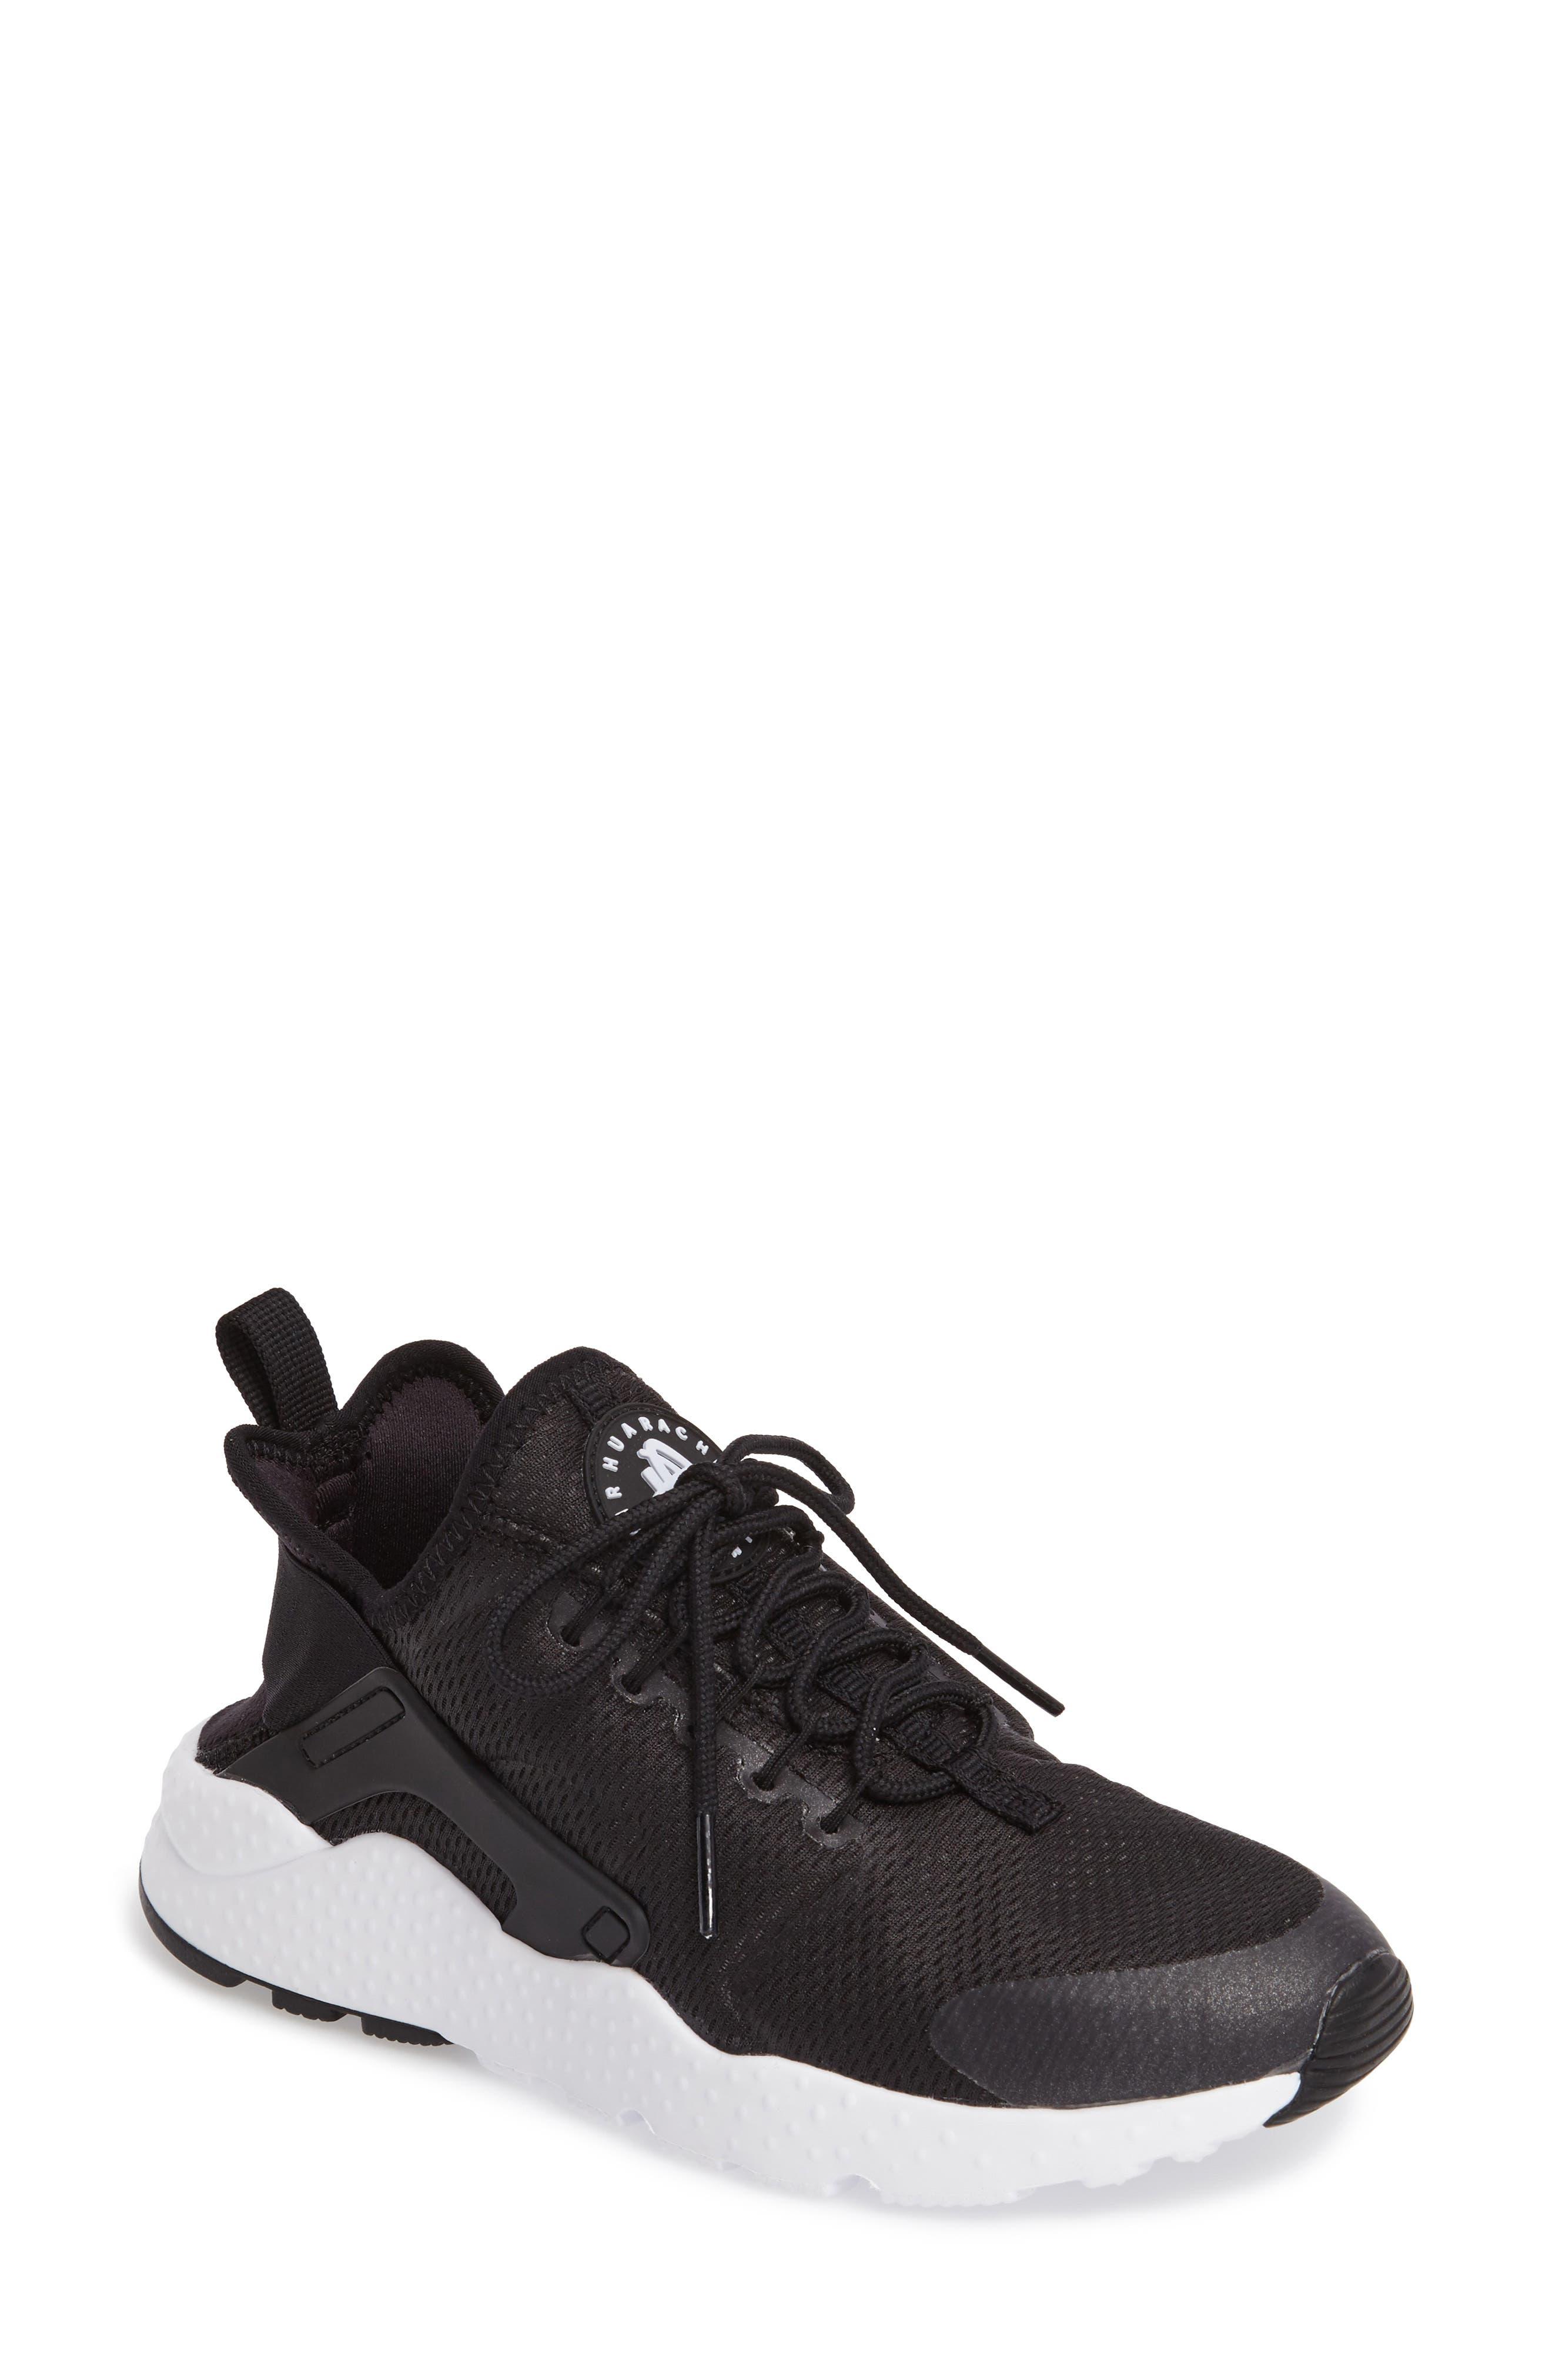 Nike Air Huarache Sneaker (Women)